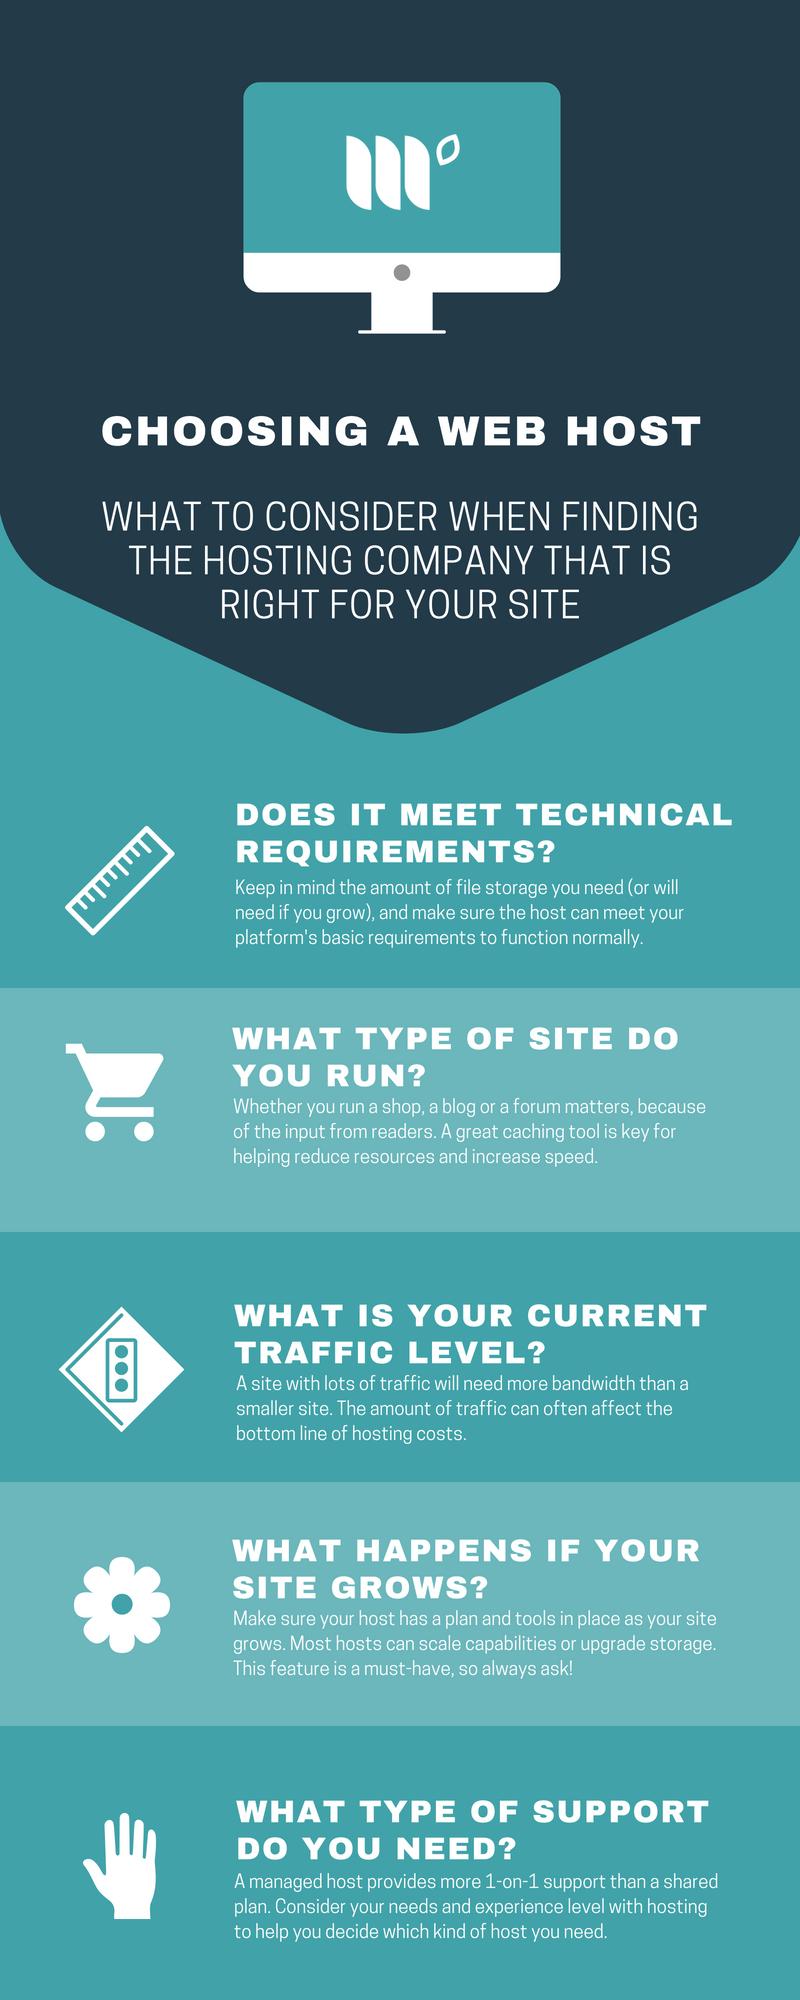 Choosing a web host infographic